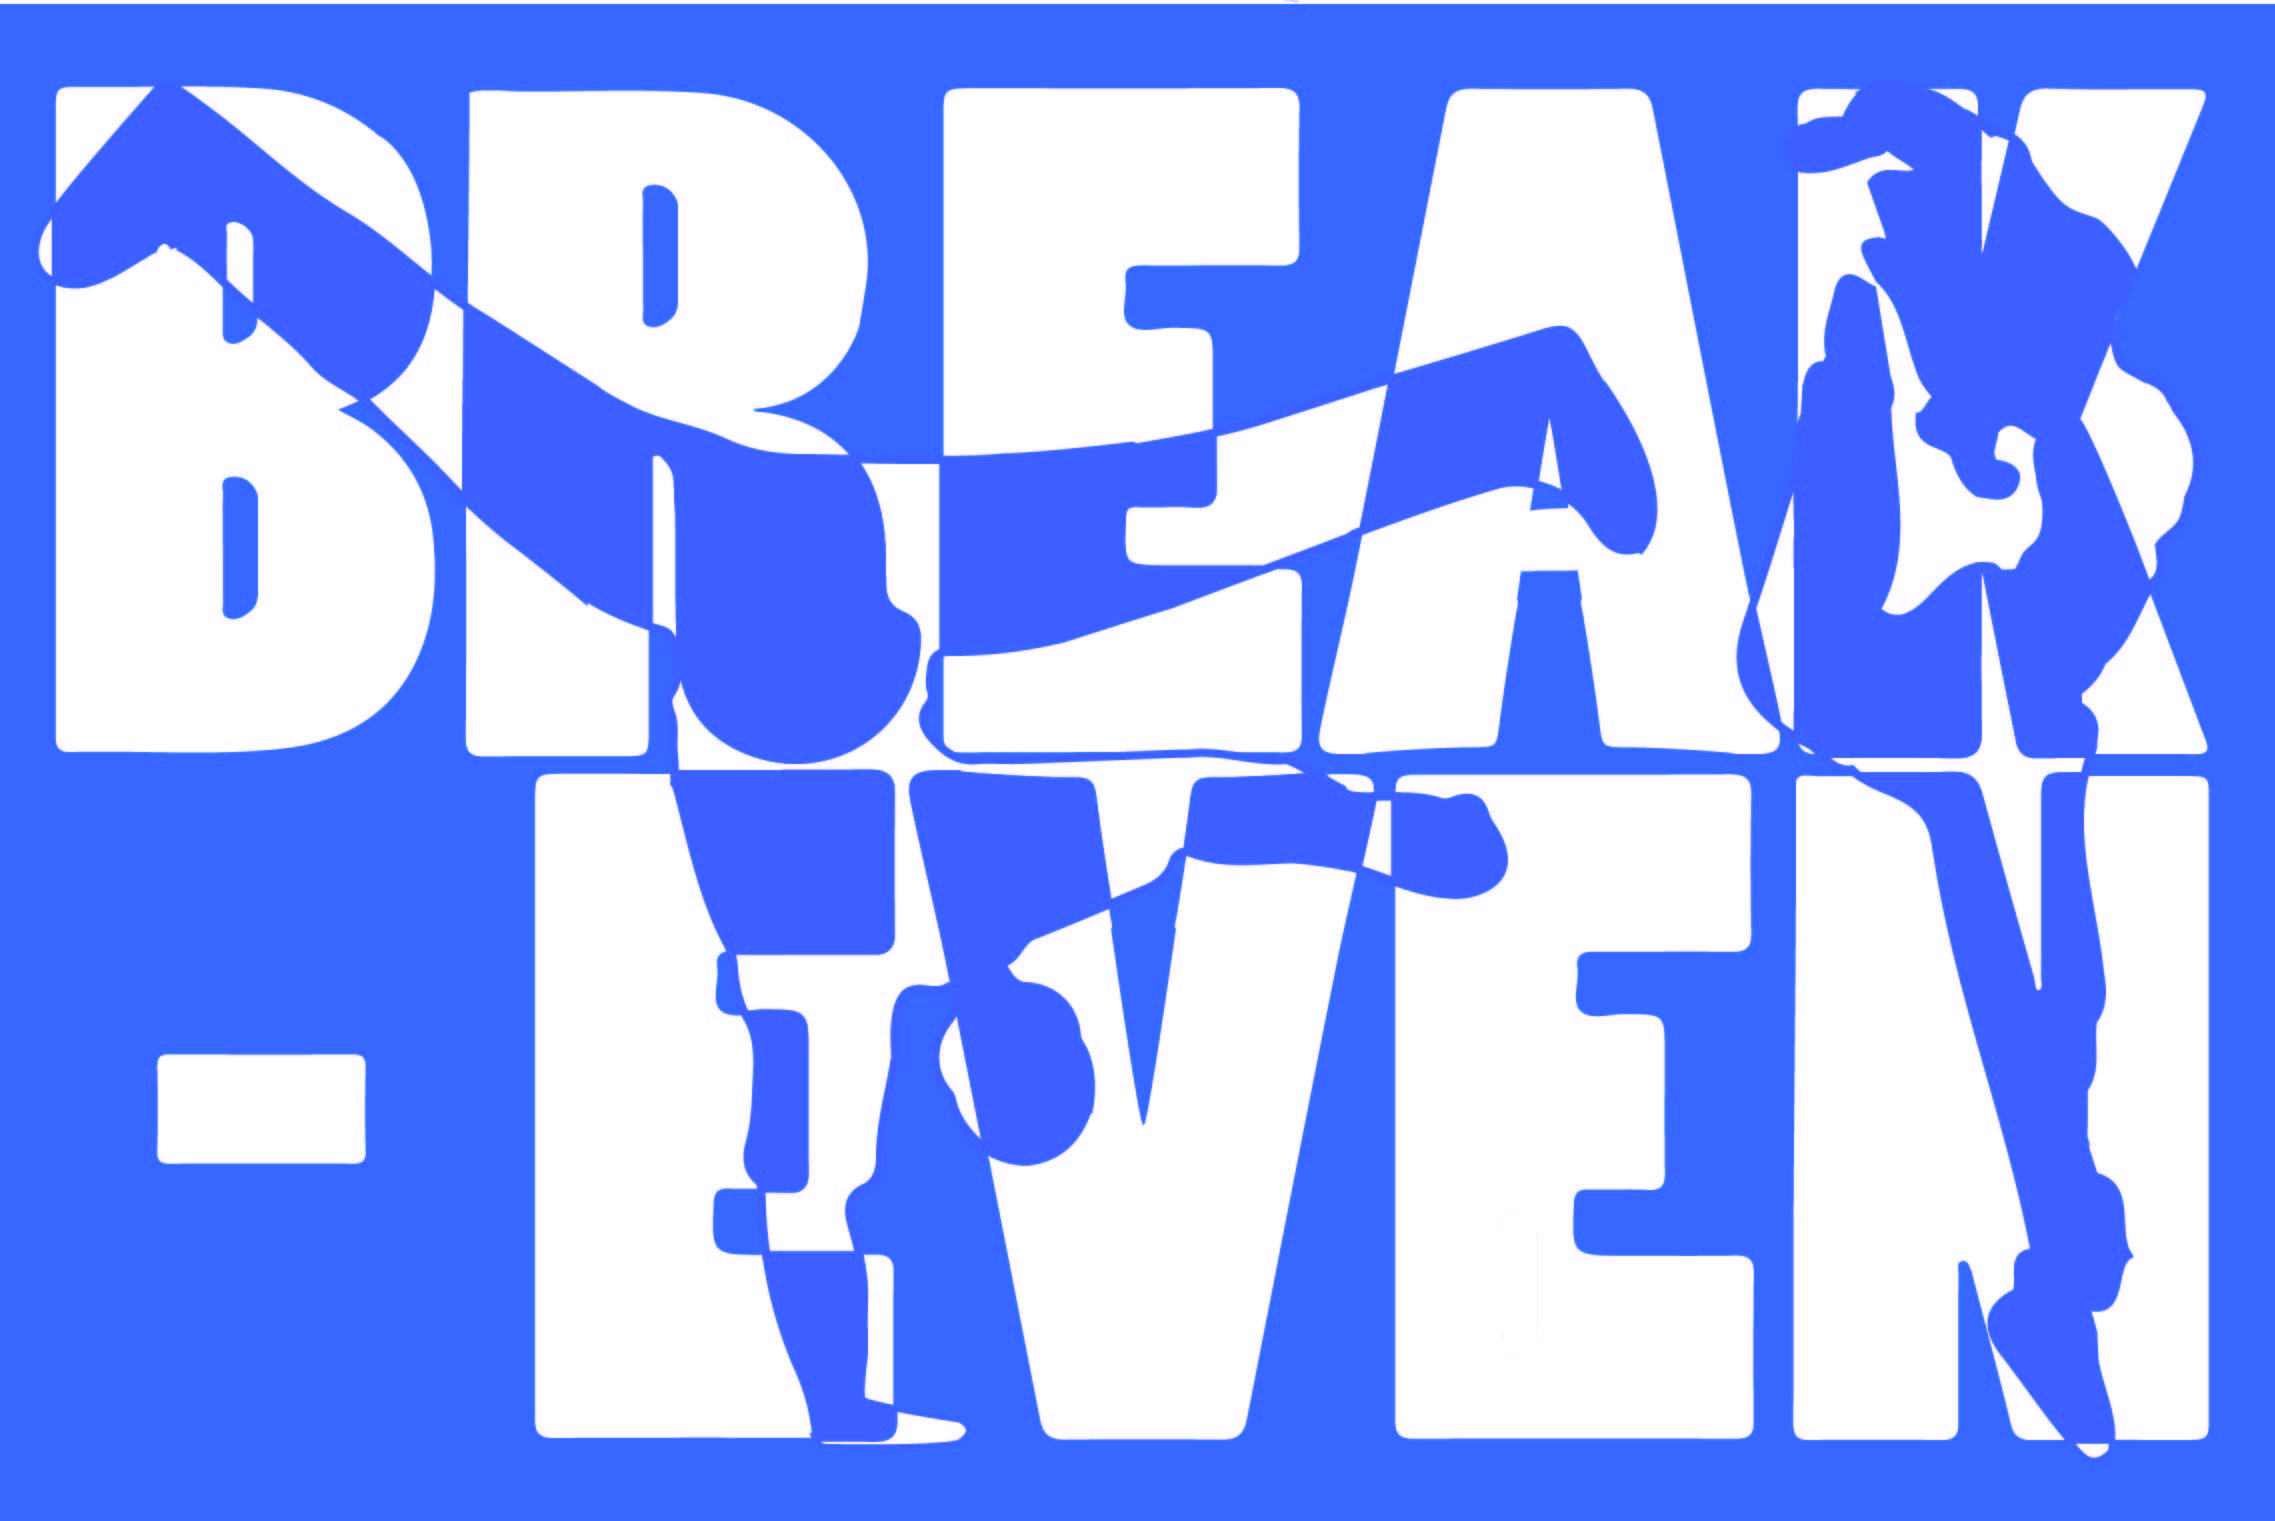 Break-Even Breakdance and HipHop | Students breakdance en hiphop association